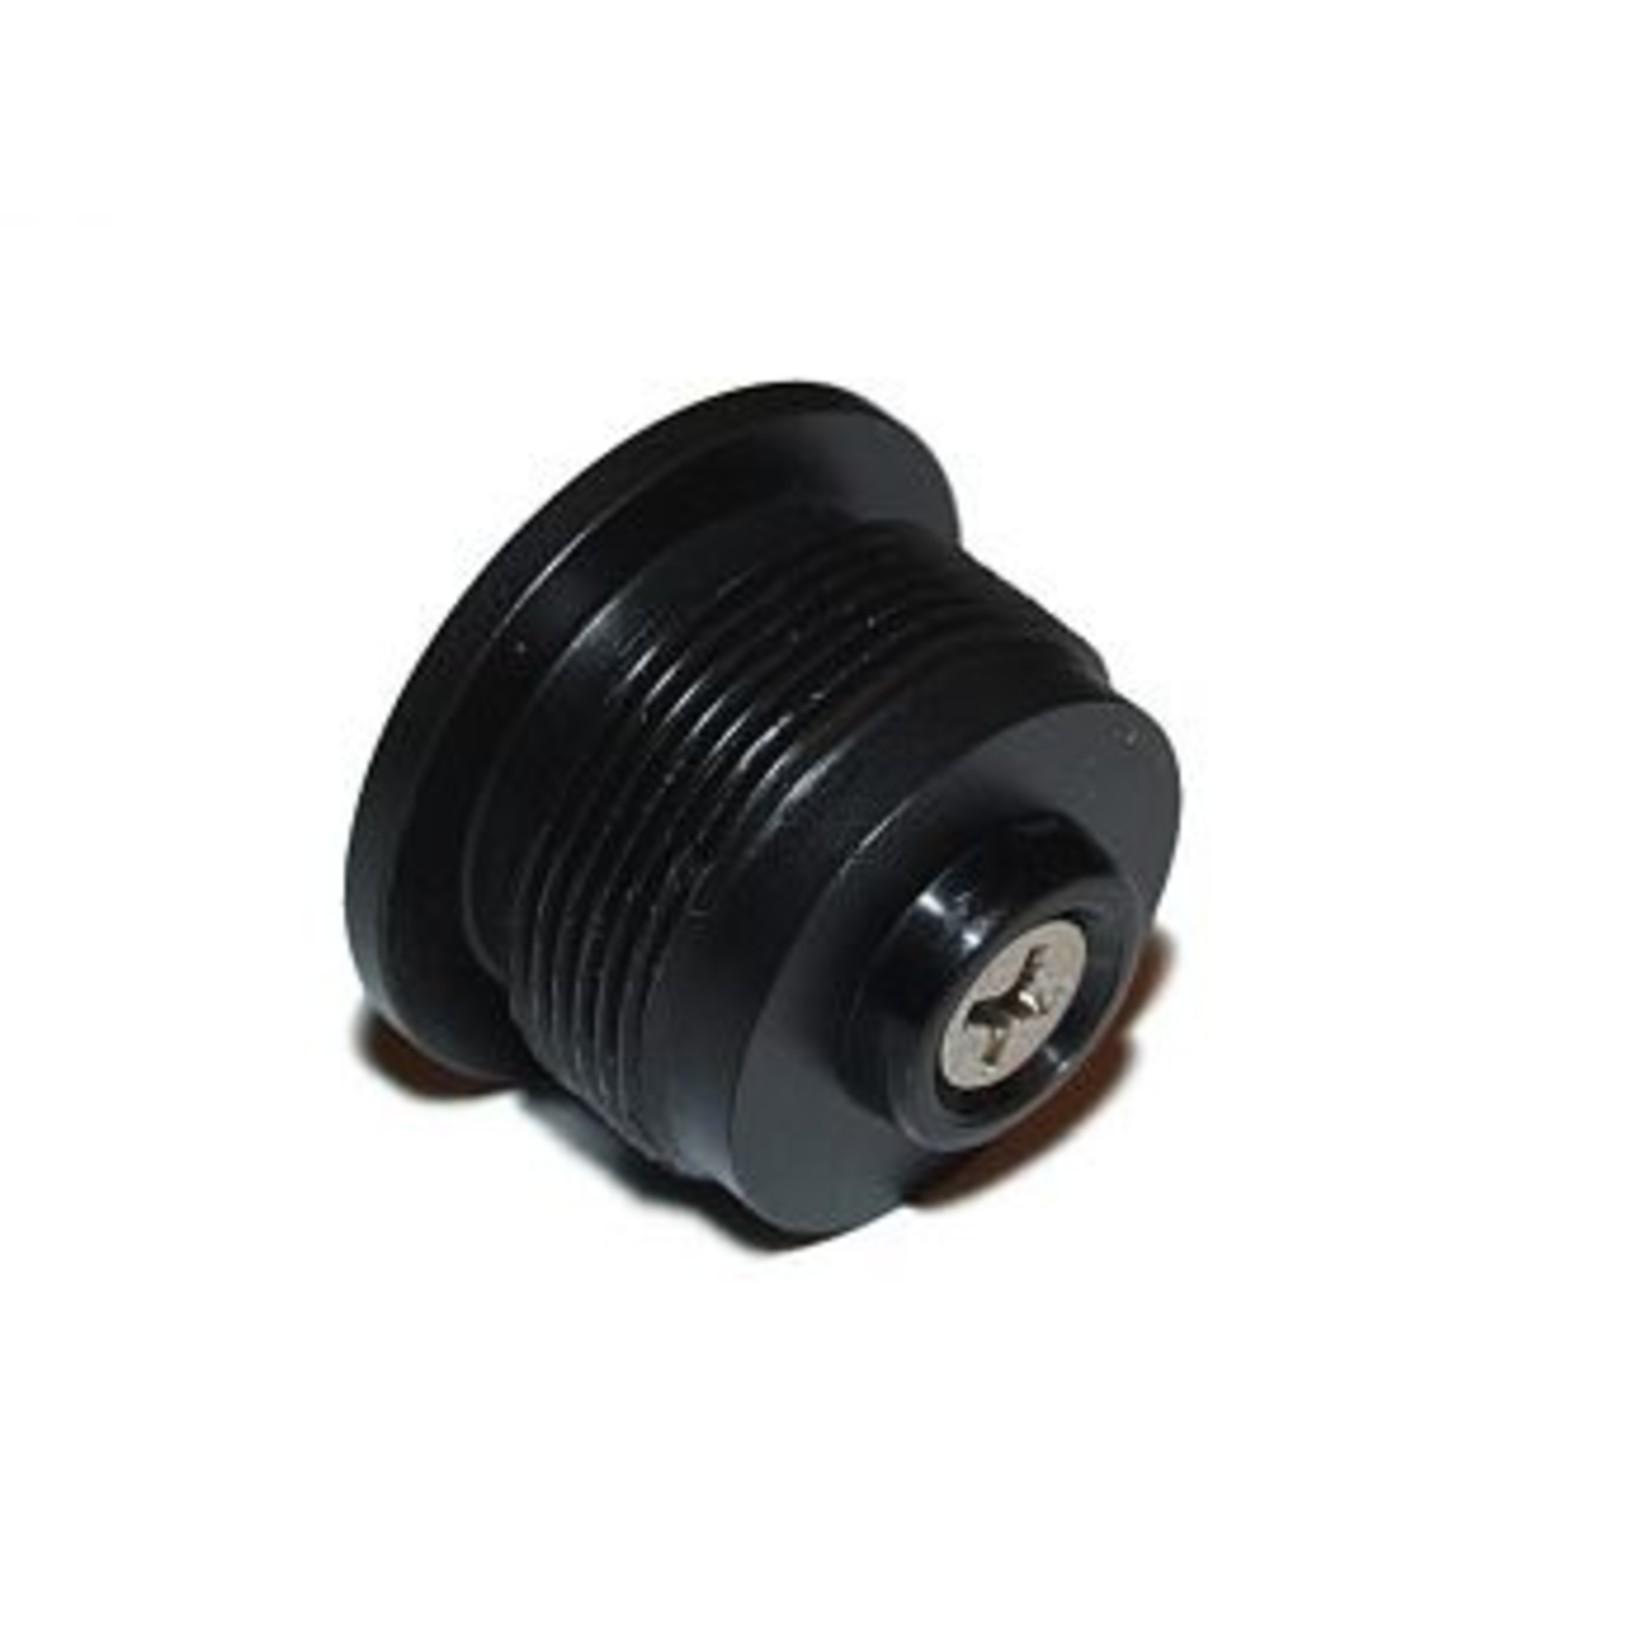 Shearwater Predator battery plug